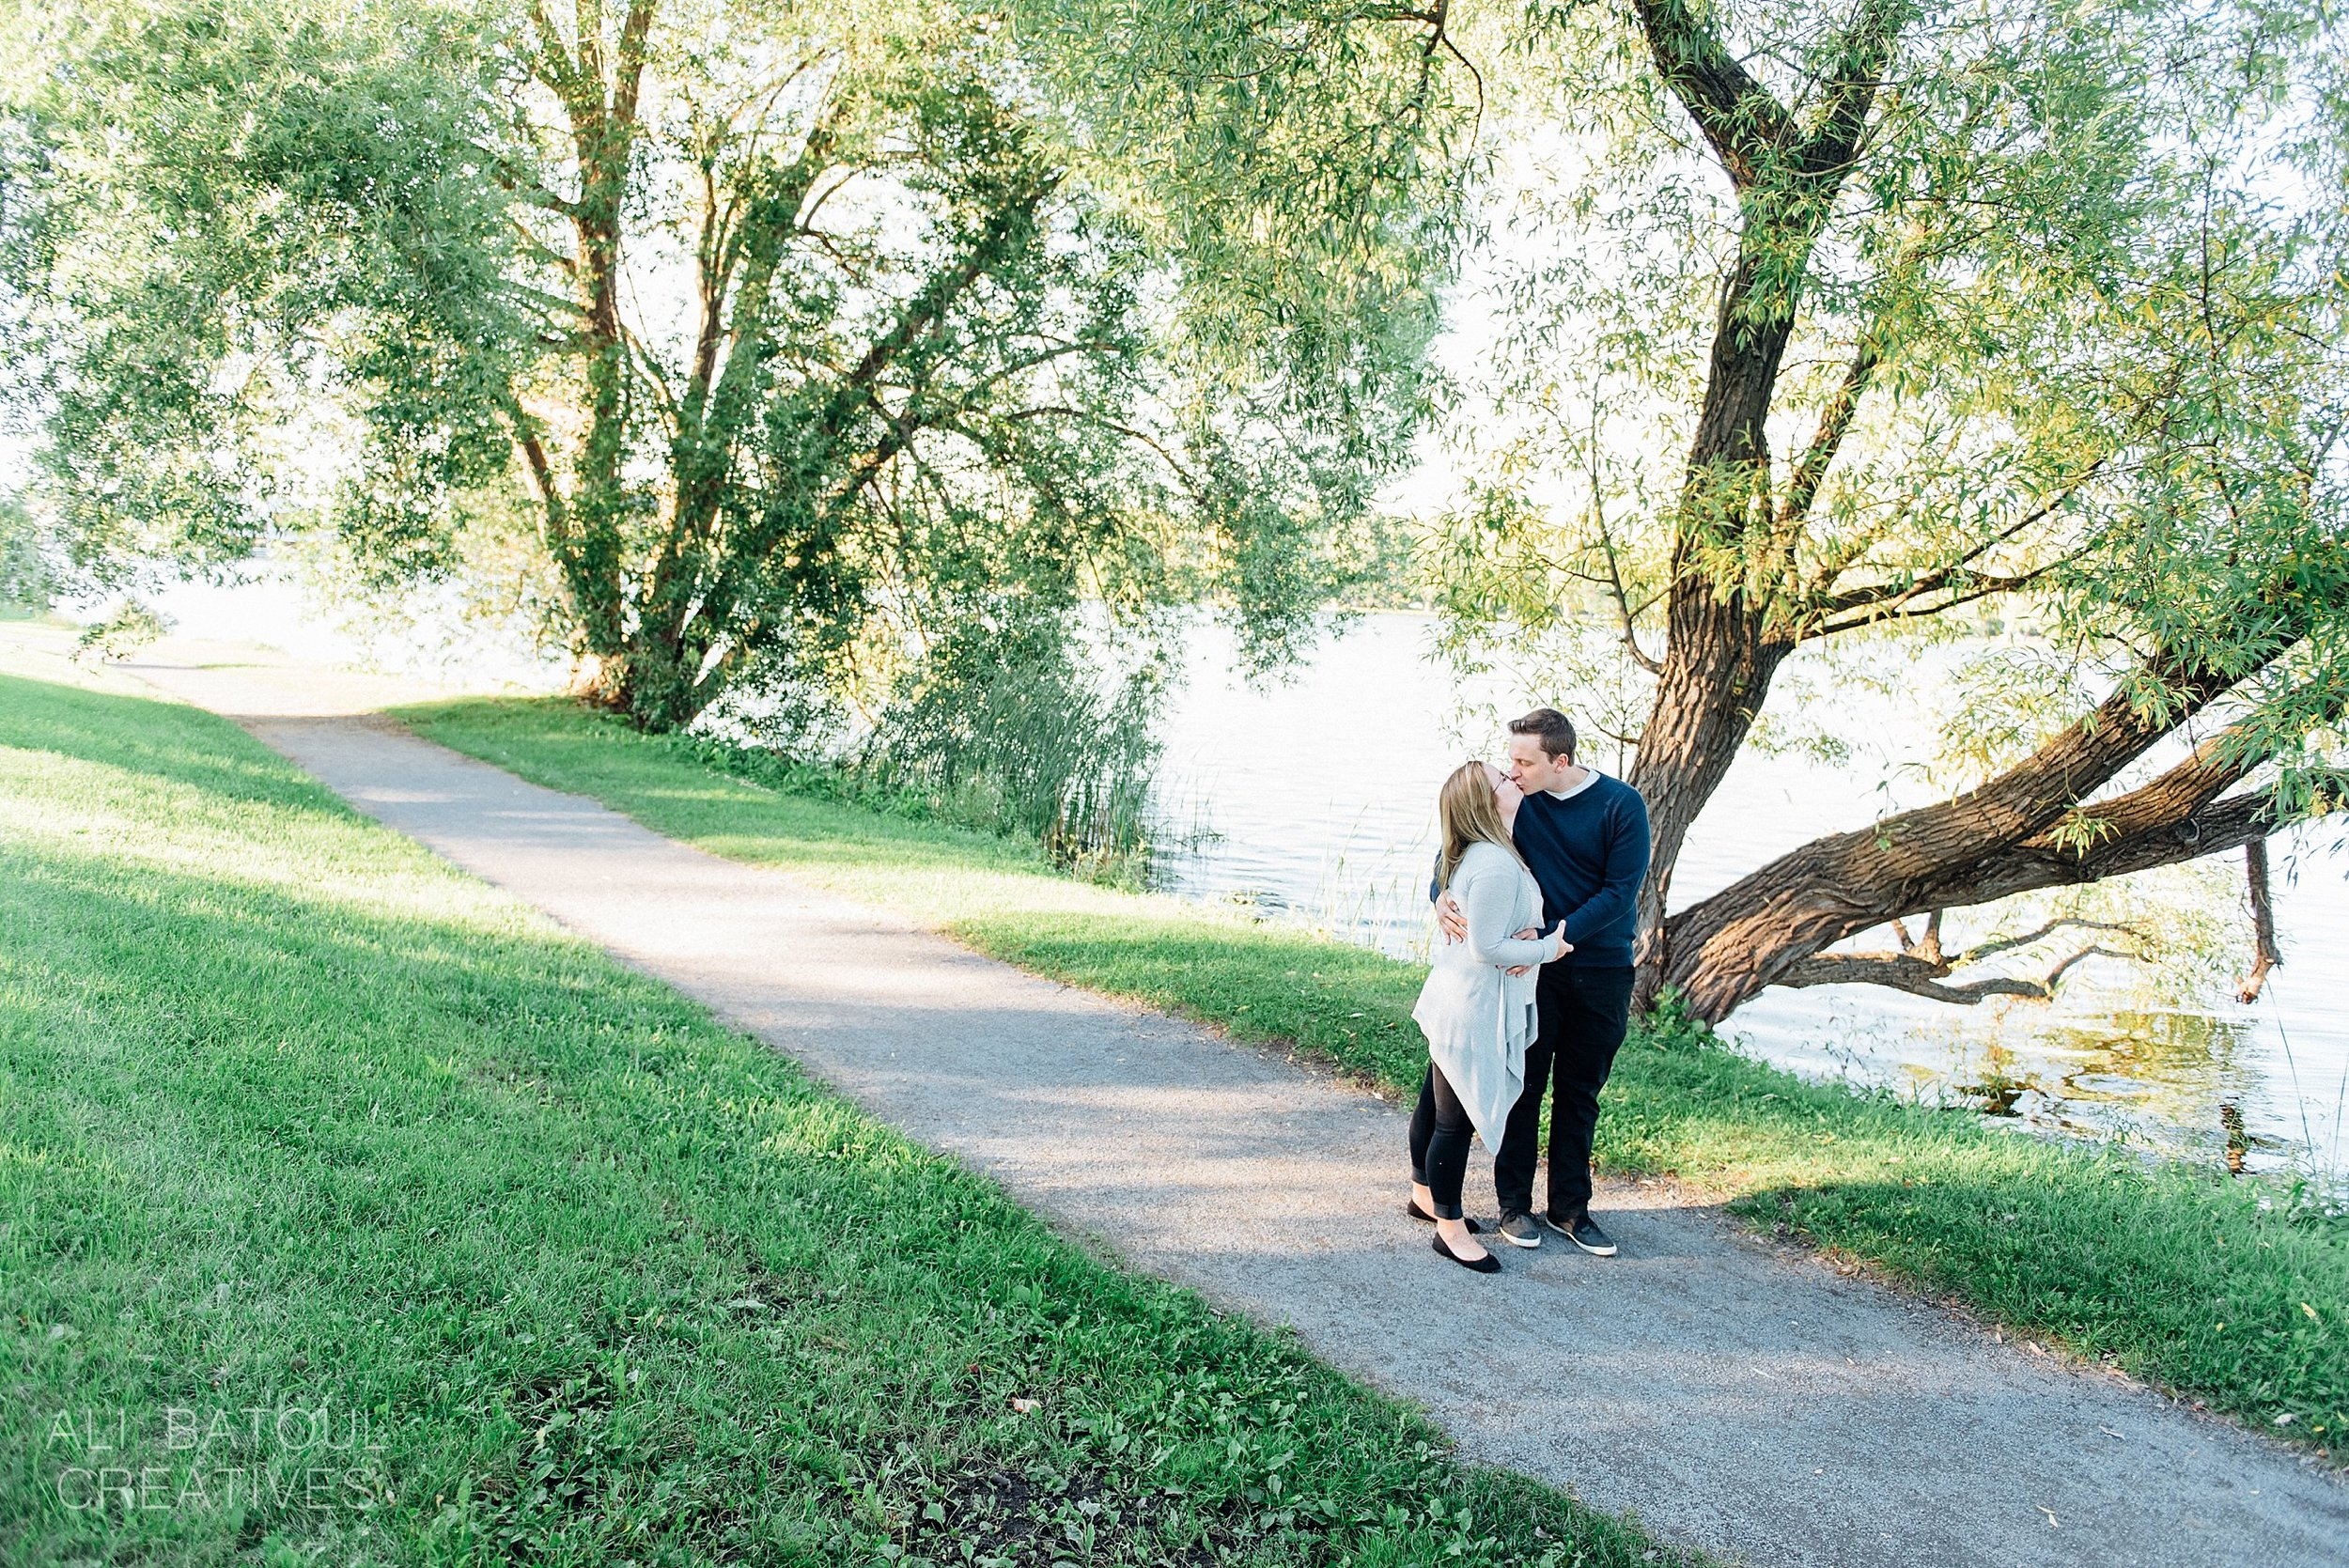 Natasha + Rich Ottawa Arboretum Engagement Photos - Ali and Batoul Fine Art Wedding Photography_0004.jpg